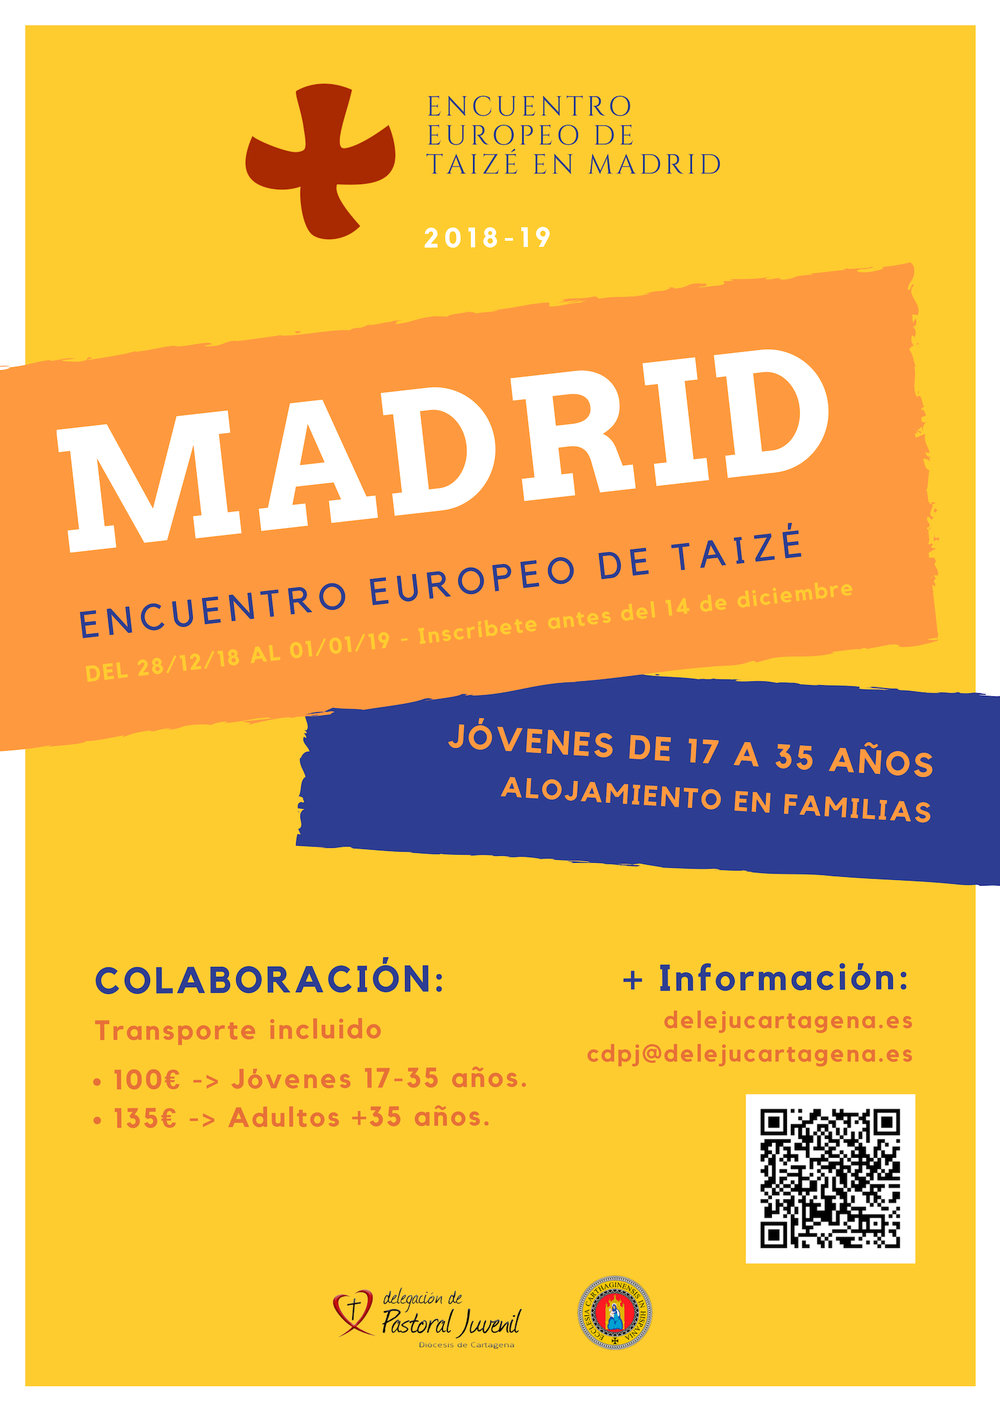 ENCUENTRO EUROPEO DE TAIZÉ EN MADRID.jpg